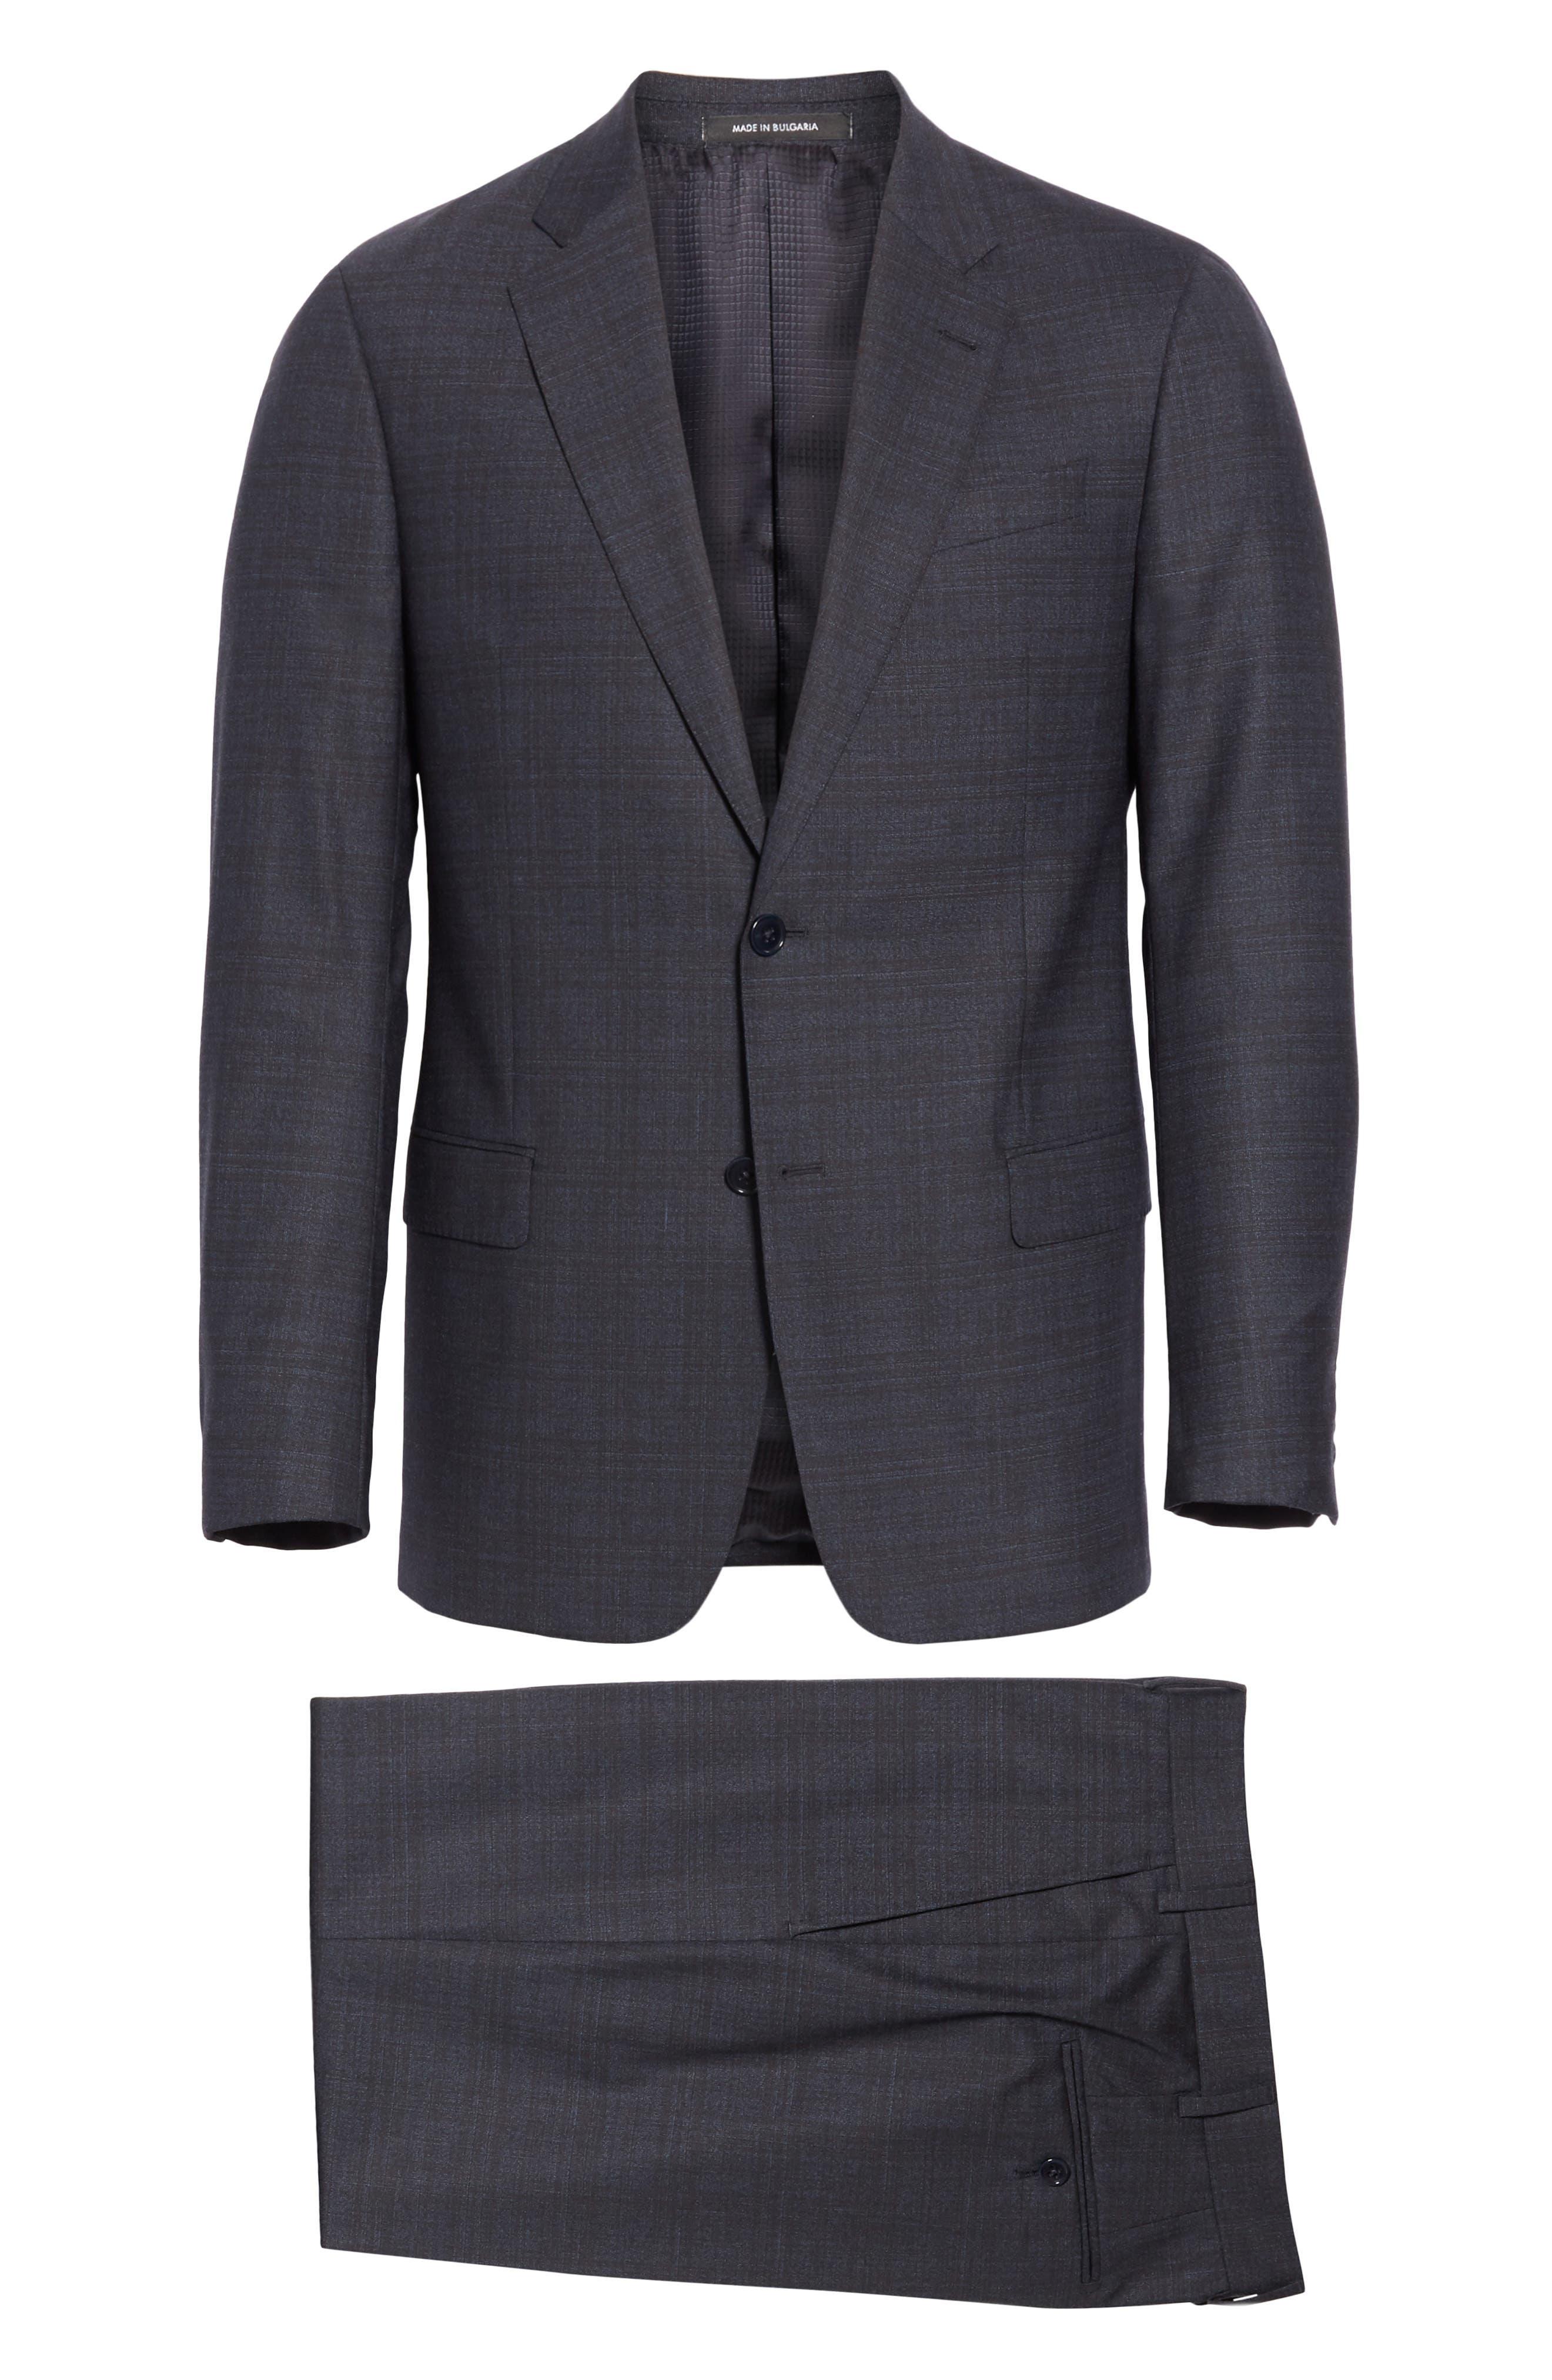 G-Line Trim Fit Stretch Plaid Wool Suit,                             Alternate thumbnail 8, color,                             NAVY/ BROWN